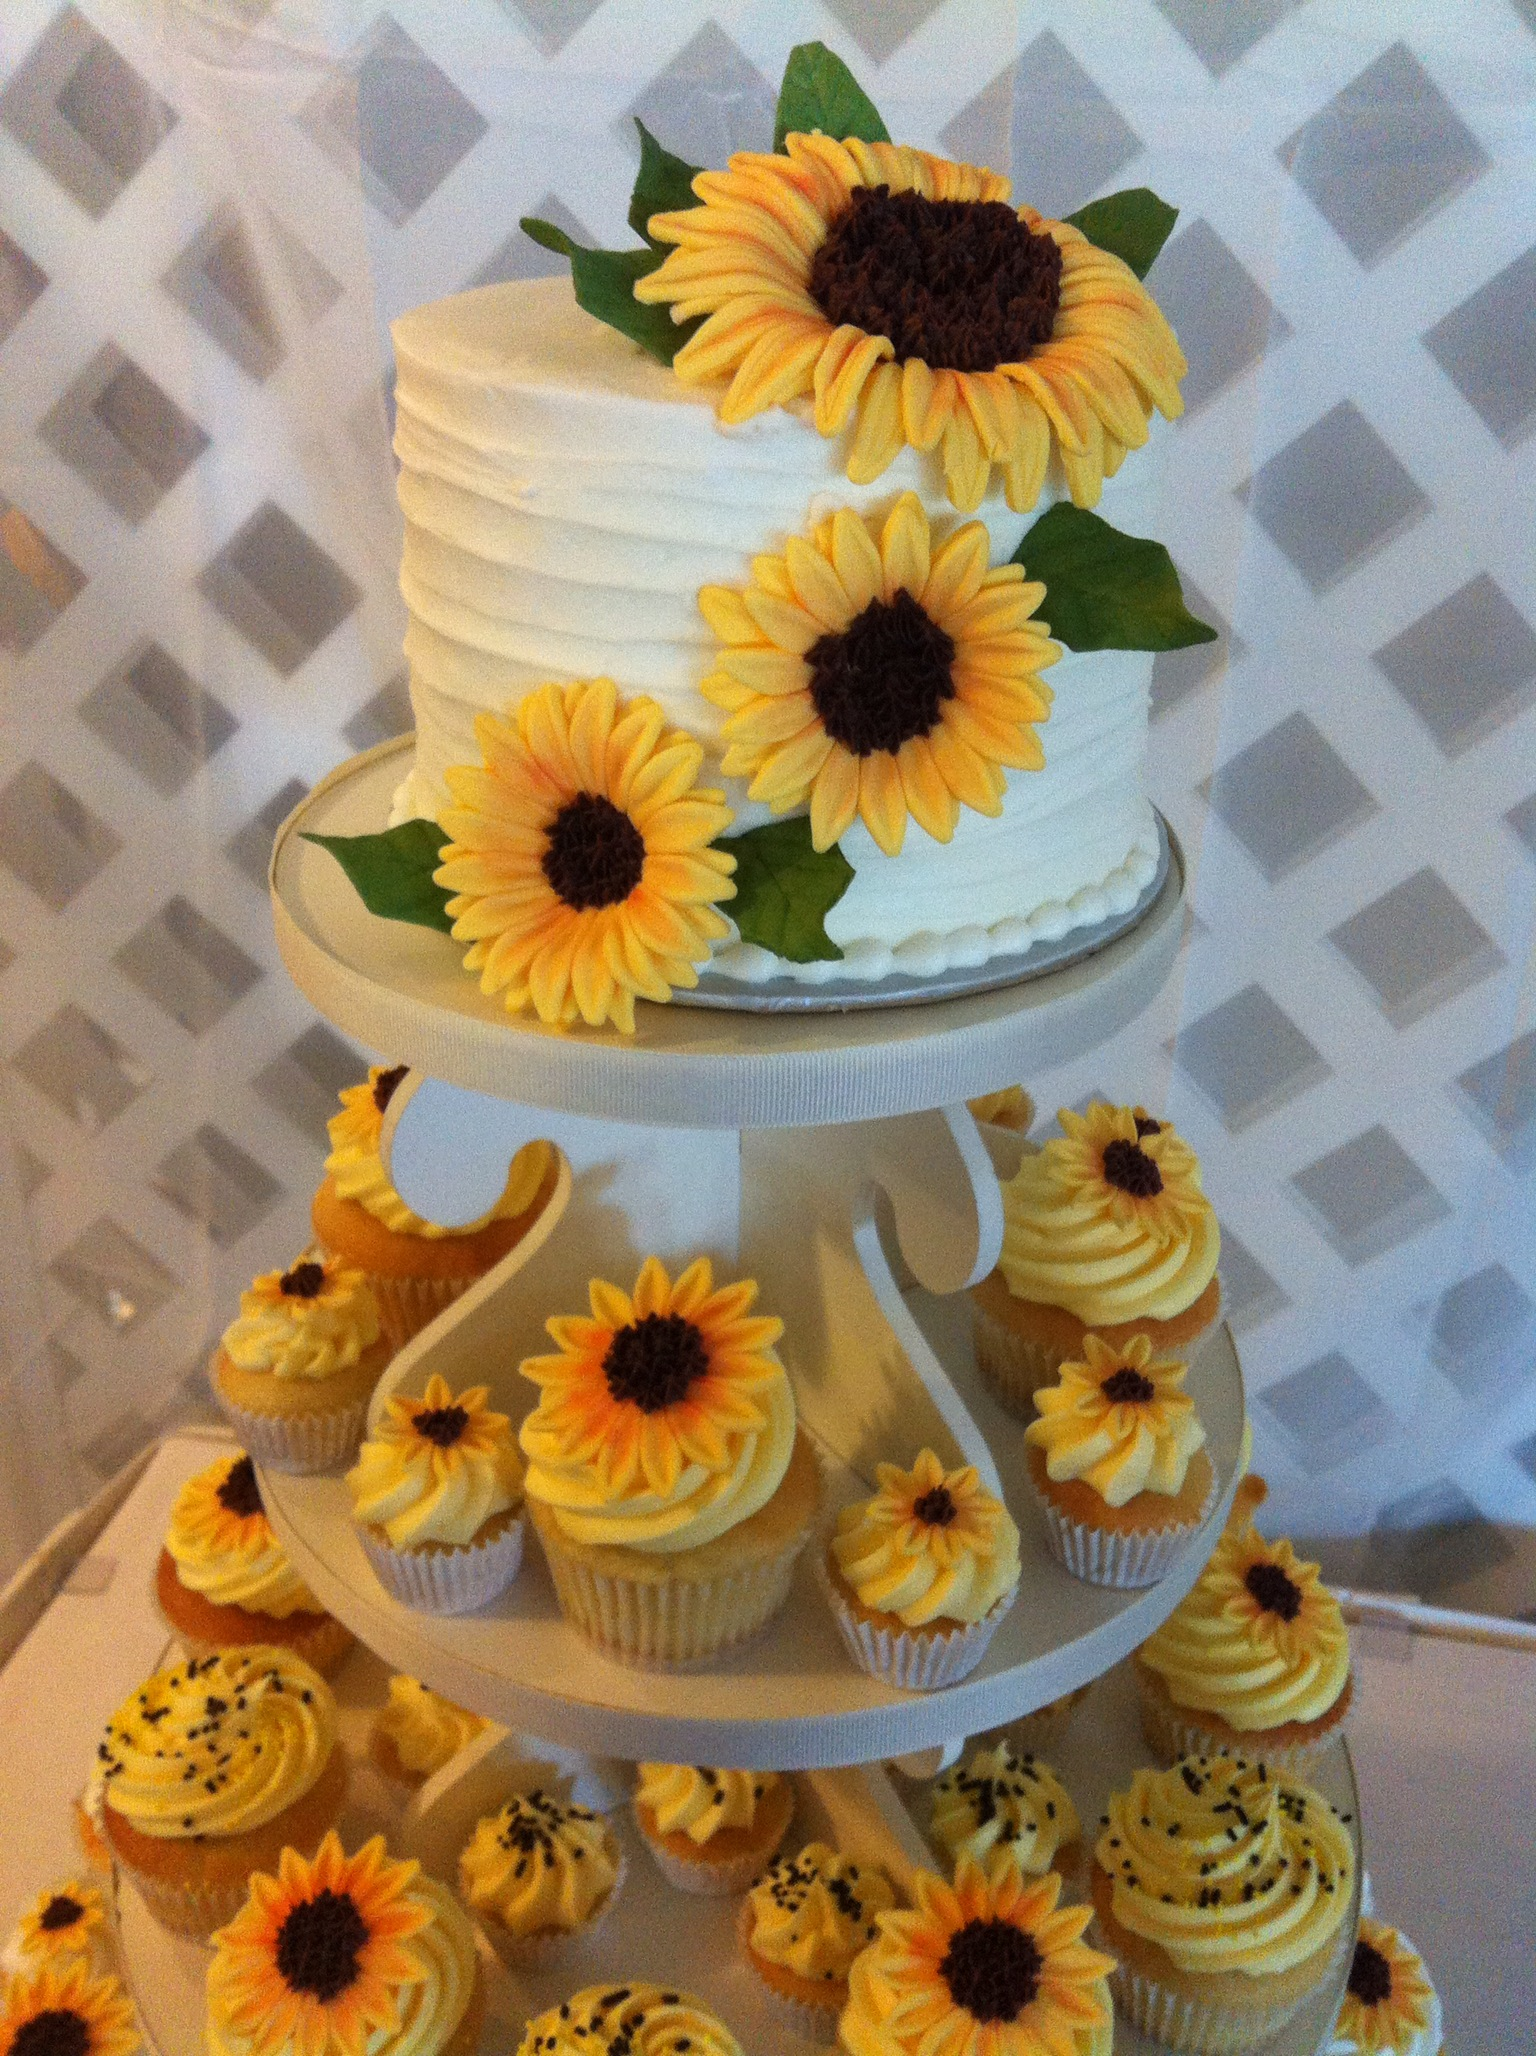 Sunflower Wedding Cakes Cake Ideas and Designs